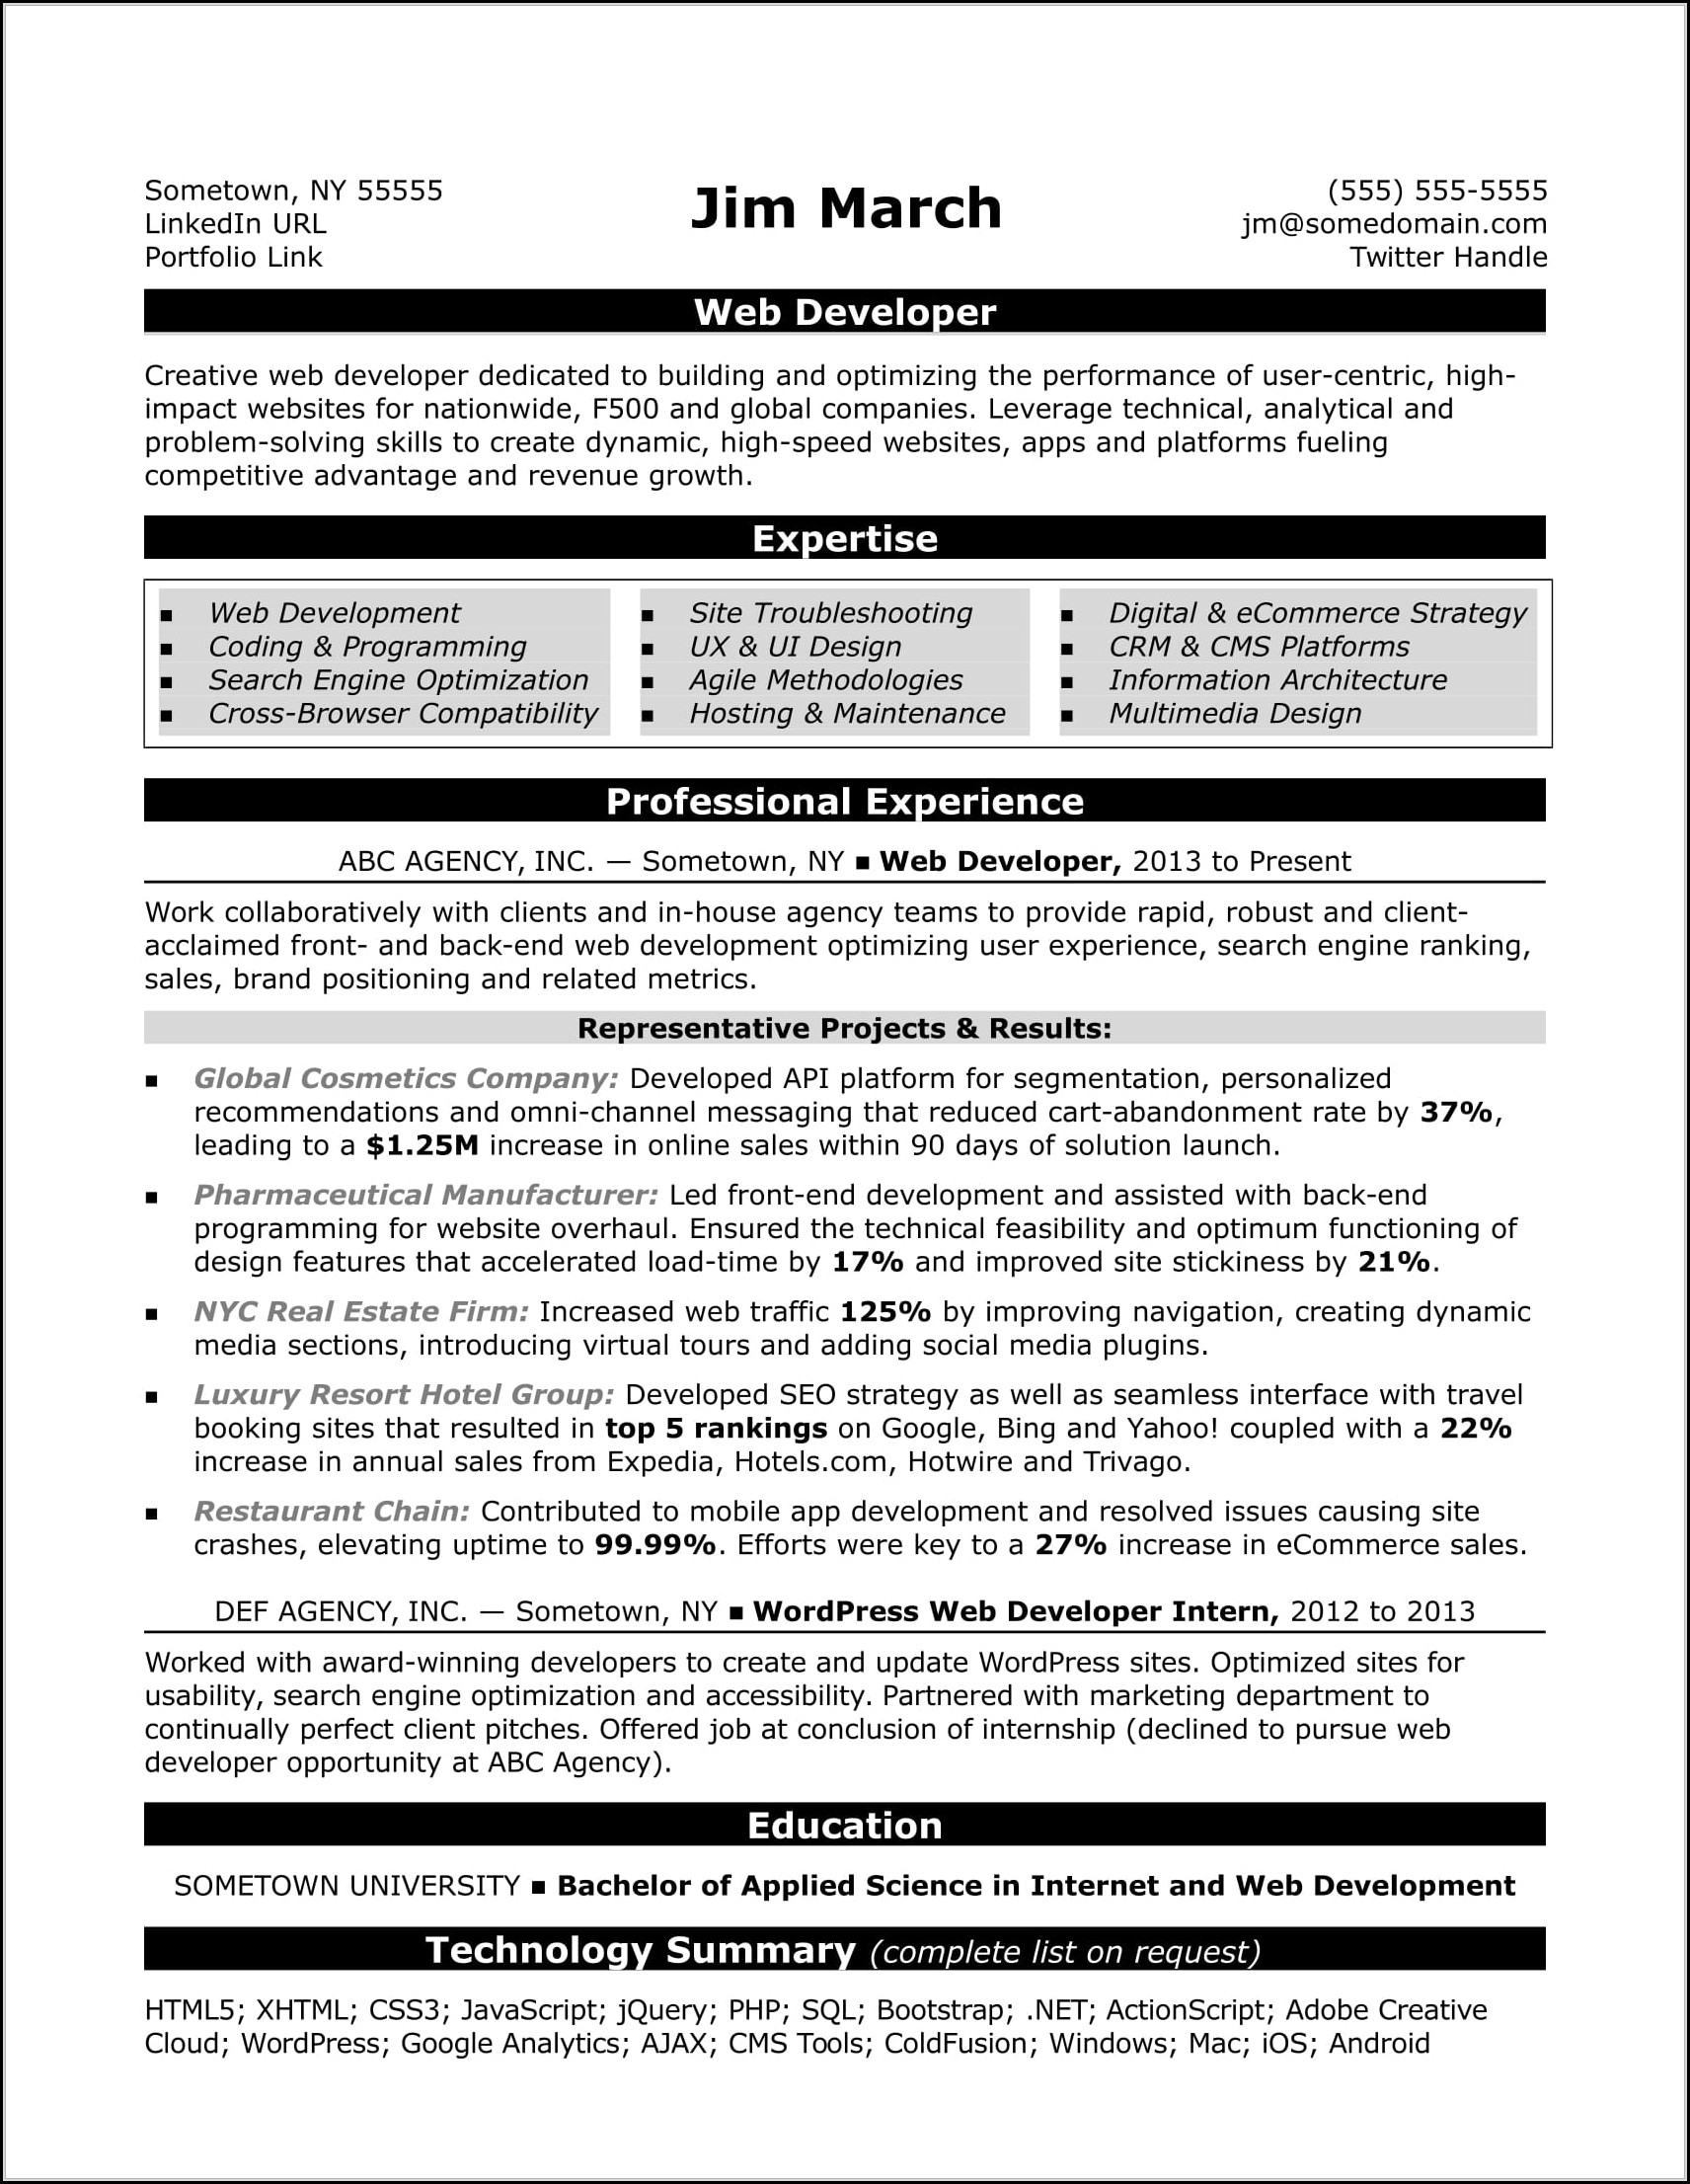 Online professional resume writing services atlanta ga